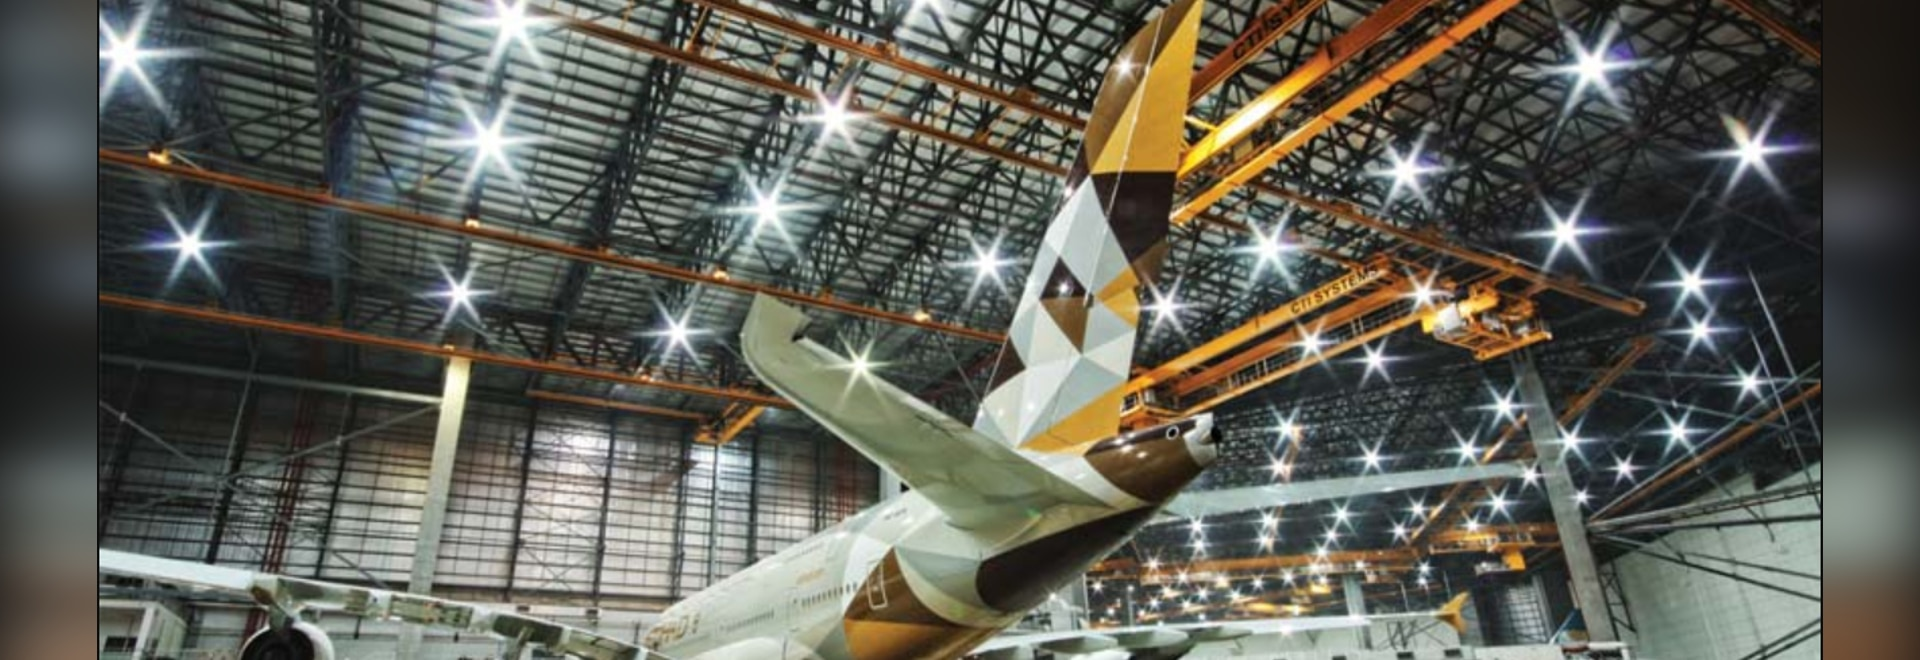 Innovation Takes Off: BigRep and Etihad Airways Engineering Partner Up